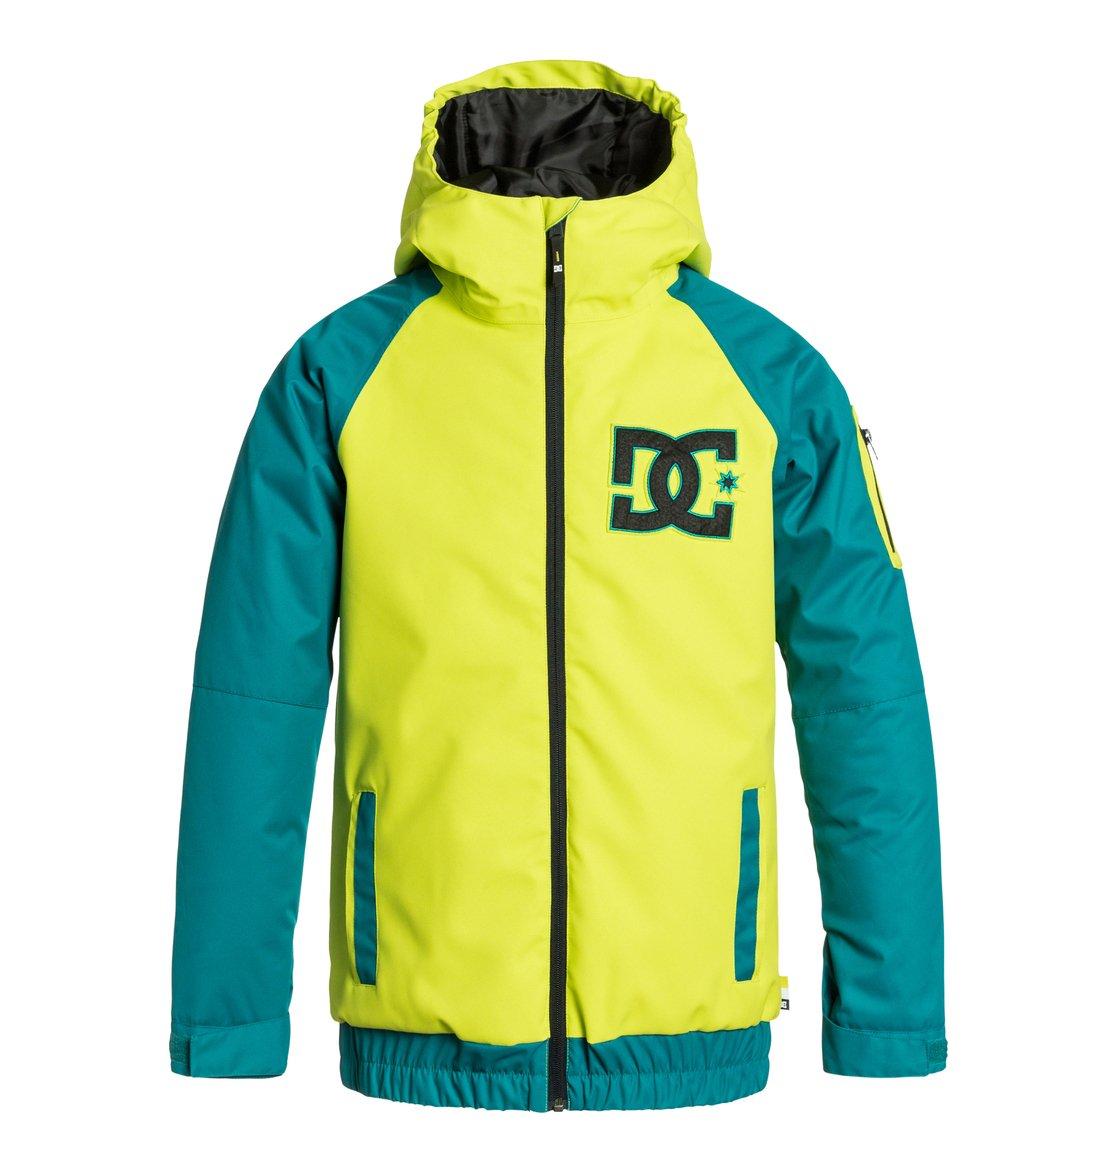 c6c34de77 0 Boy's Troop Snow Jacket EDBTJ03005 DC Shoes